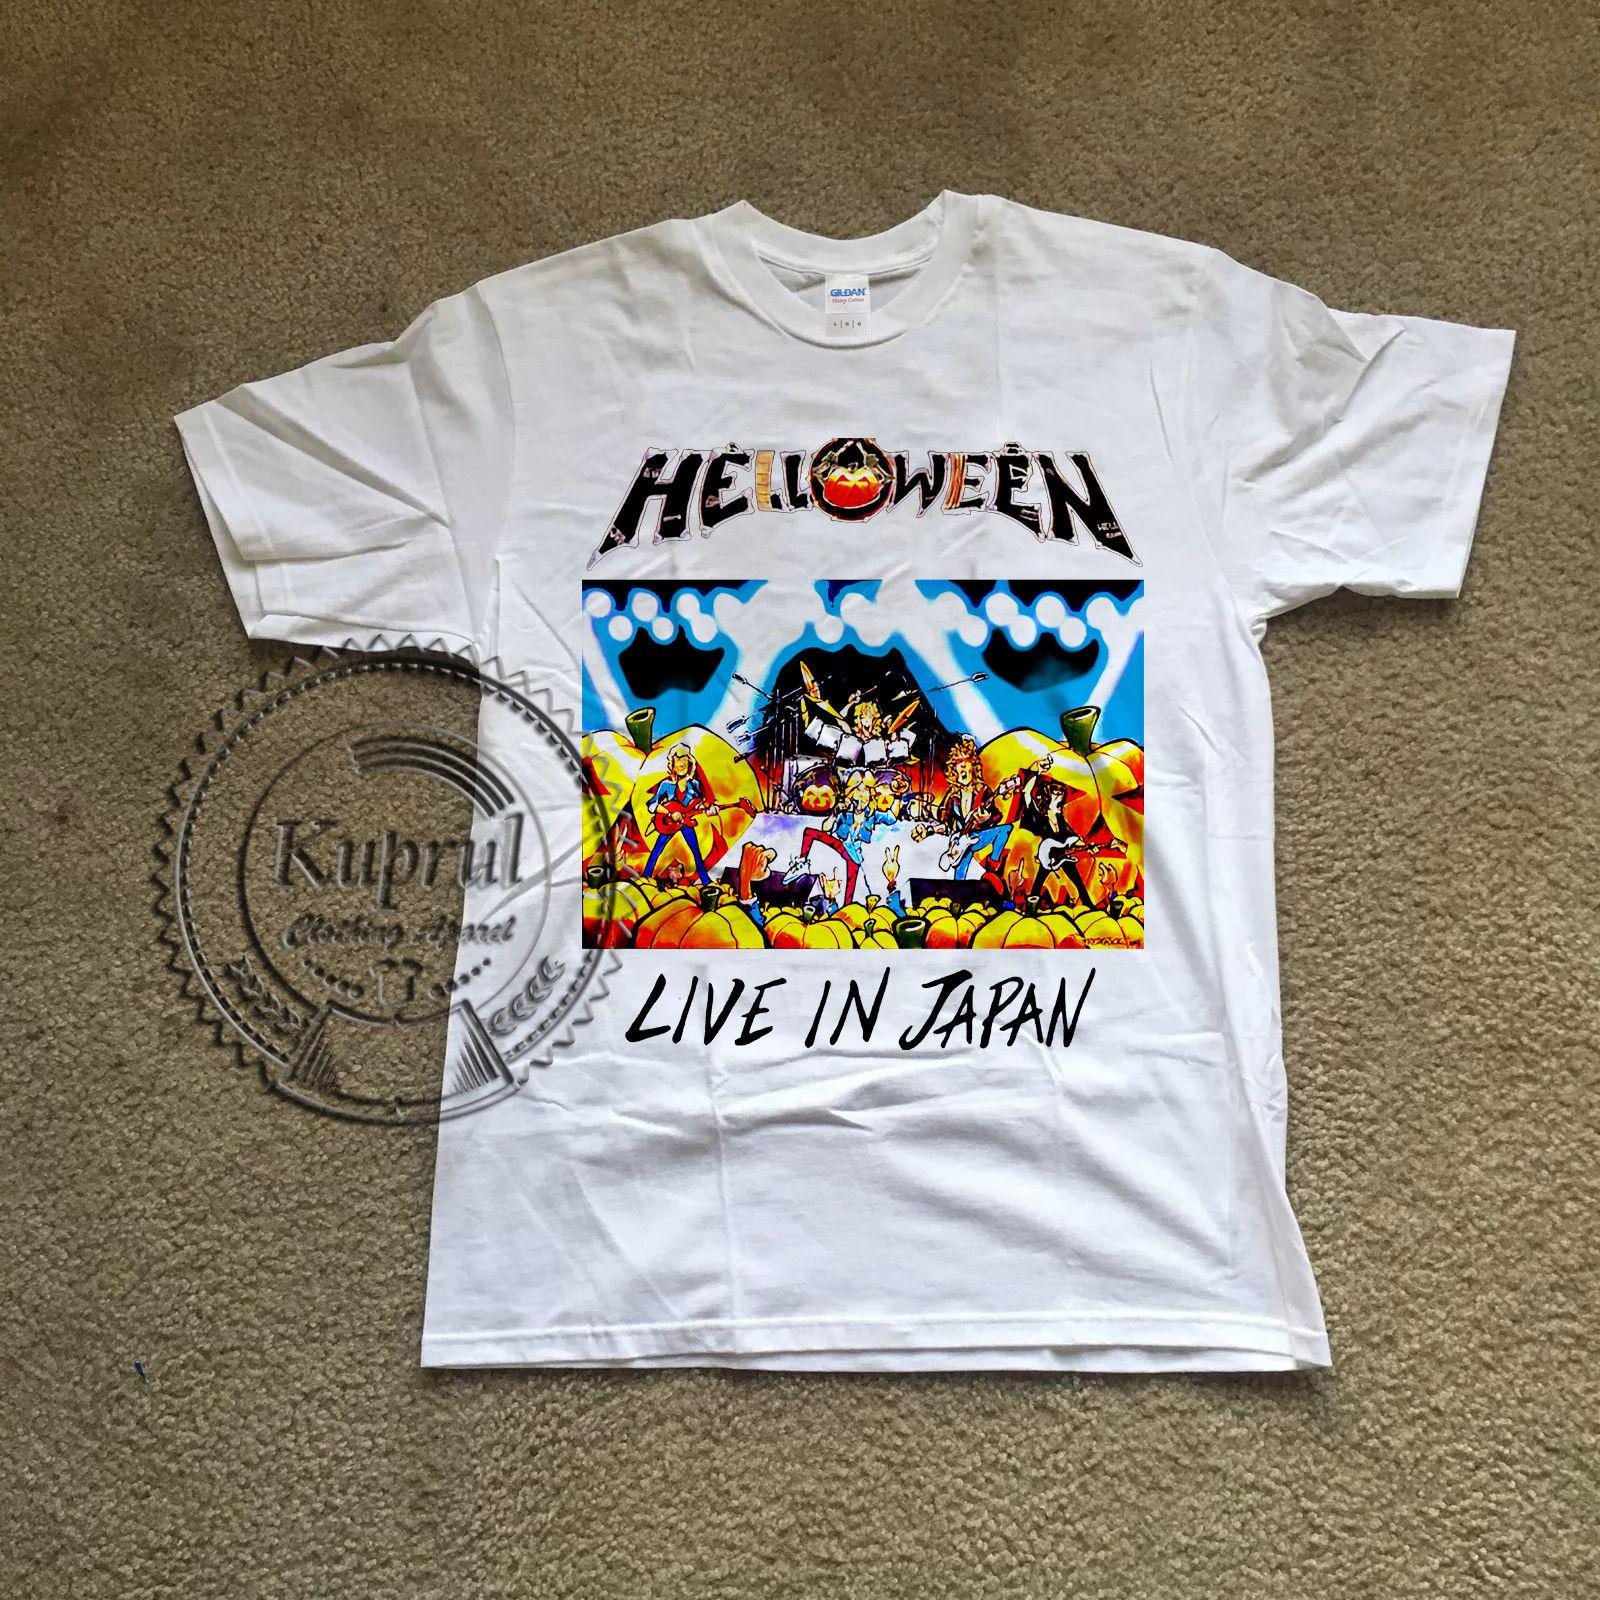 6075f8216 Vintage Helloween Shirt Live In Japan Tour 88 89 Reprint Cheap Tee,2019 Hot  Tees Fashion Style Men Tee Mens Tee Shirts Shirts And Tshirts Tee Shirts  Sale ...